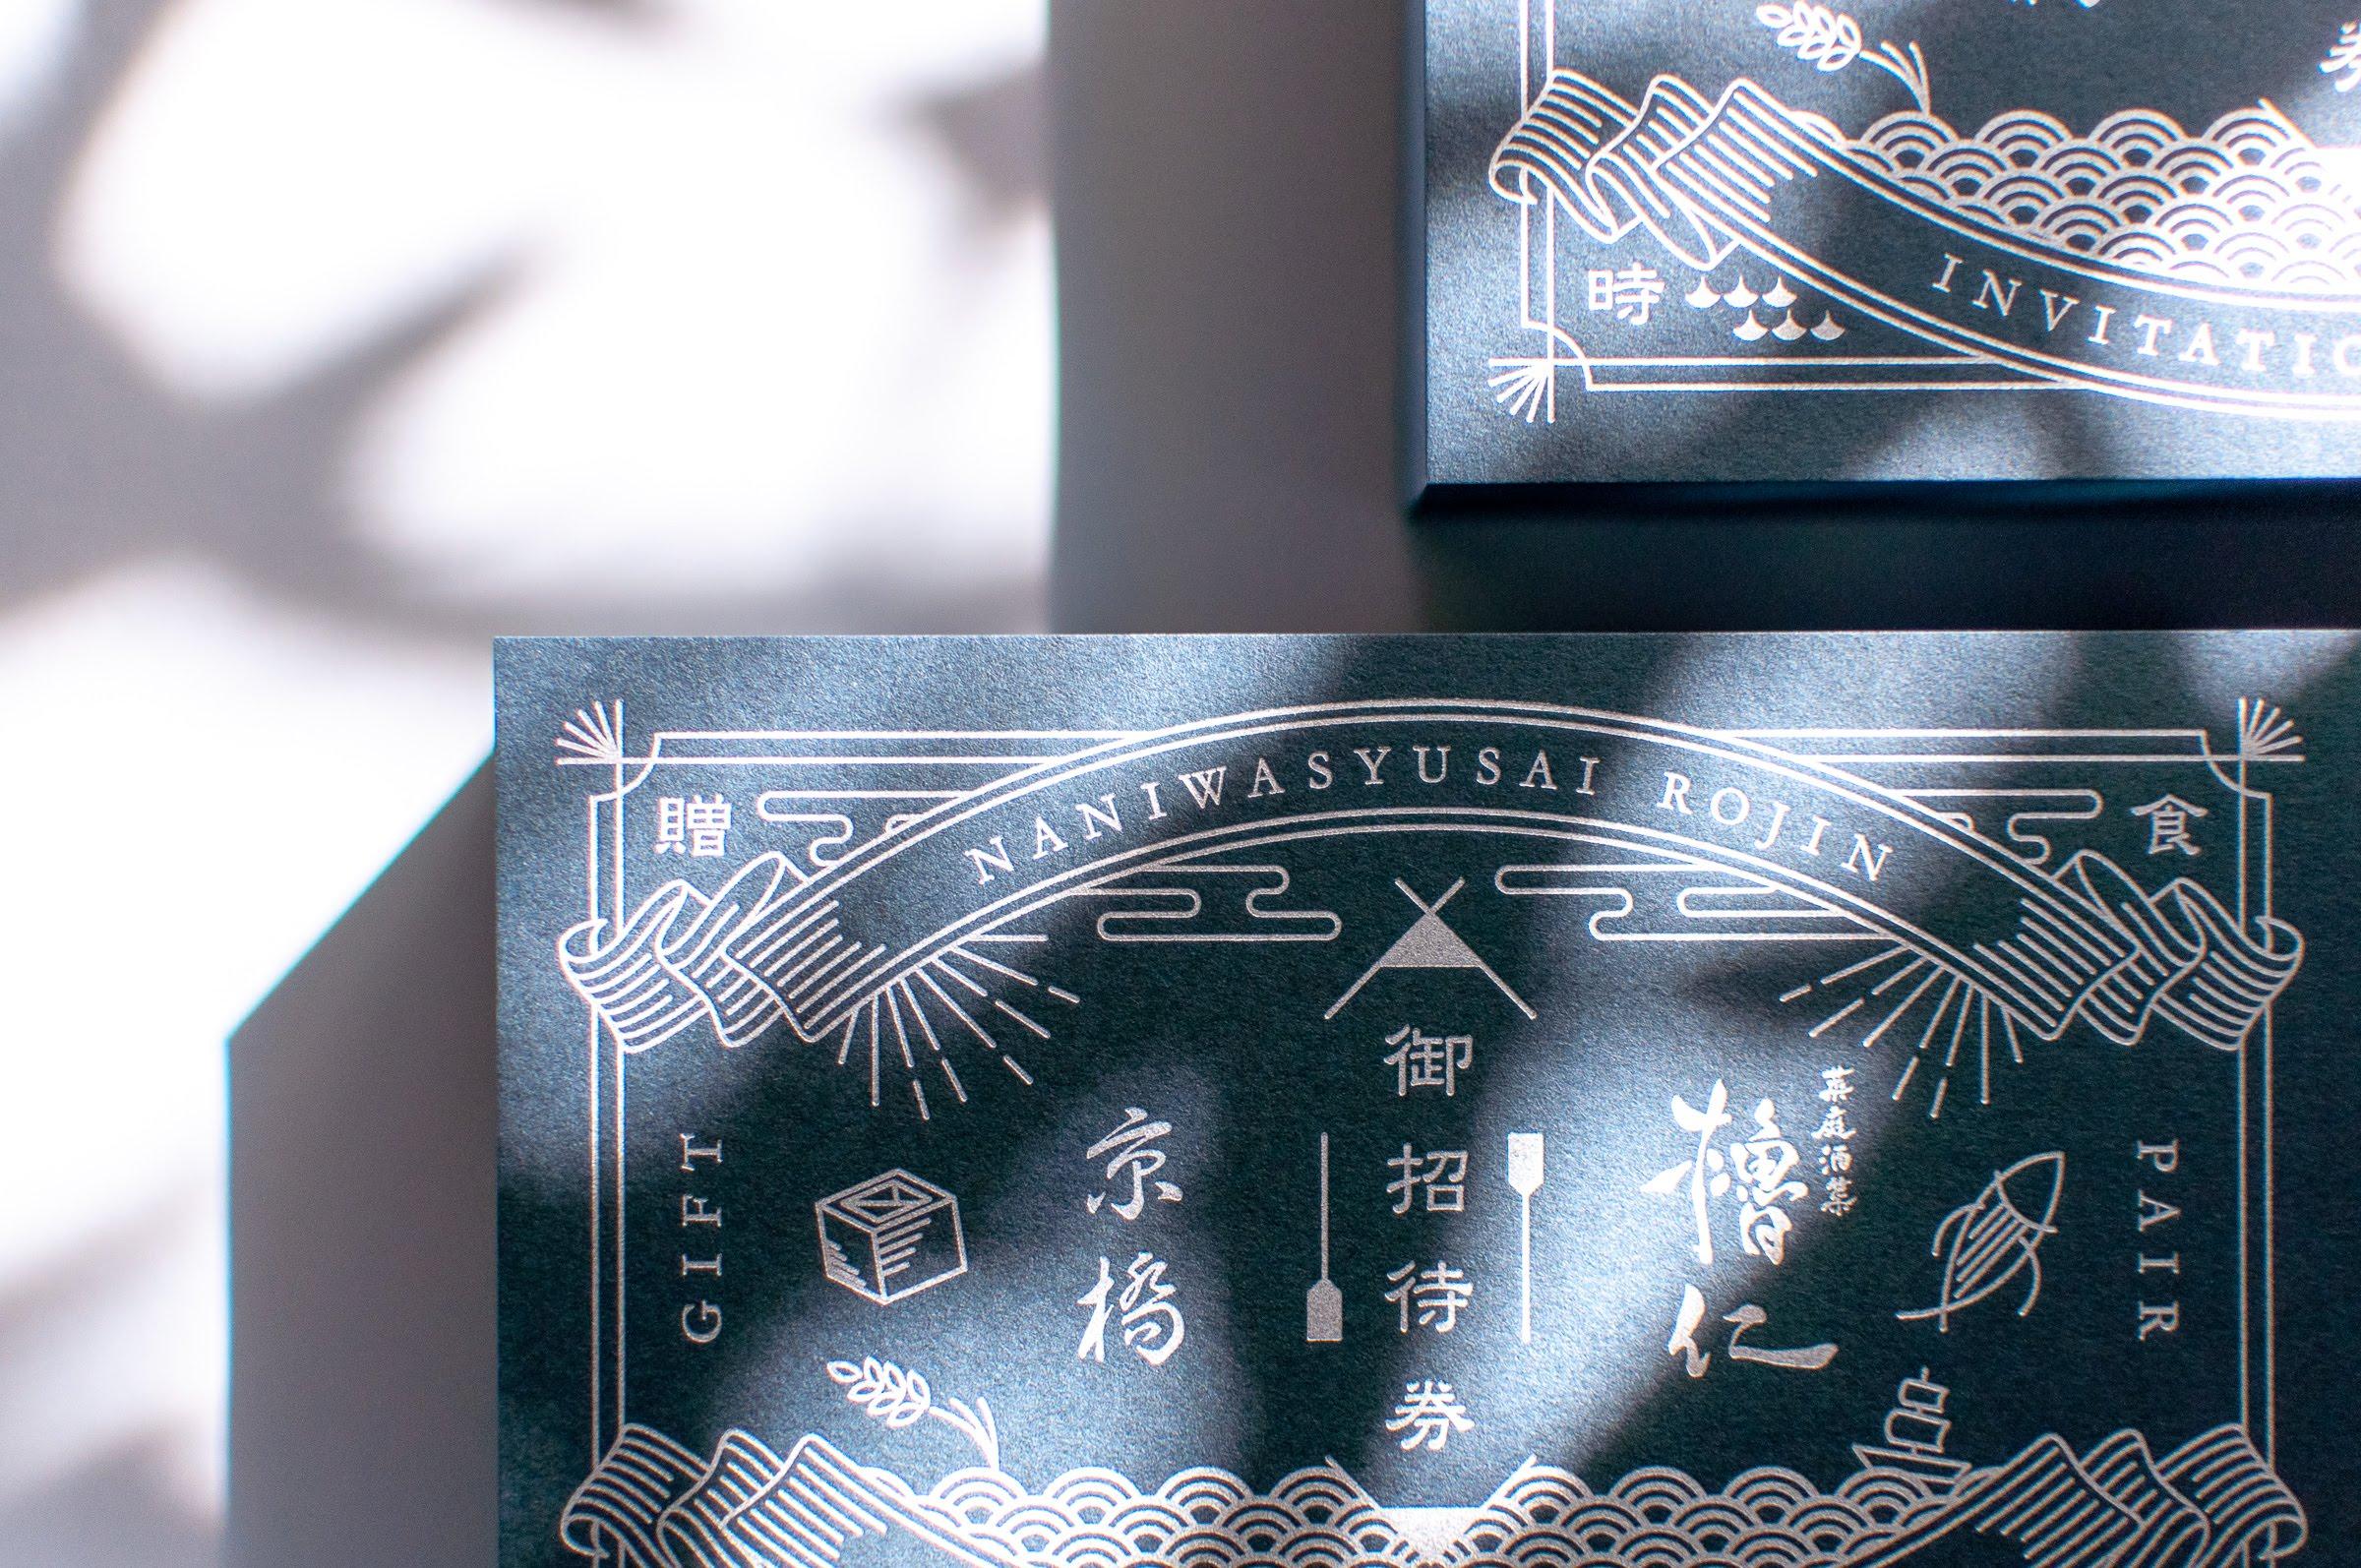 京橋 櫓仁|GIFT CARD